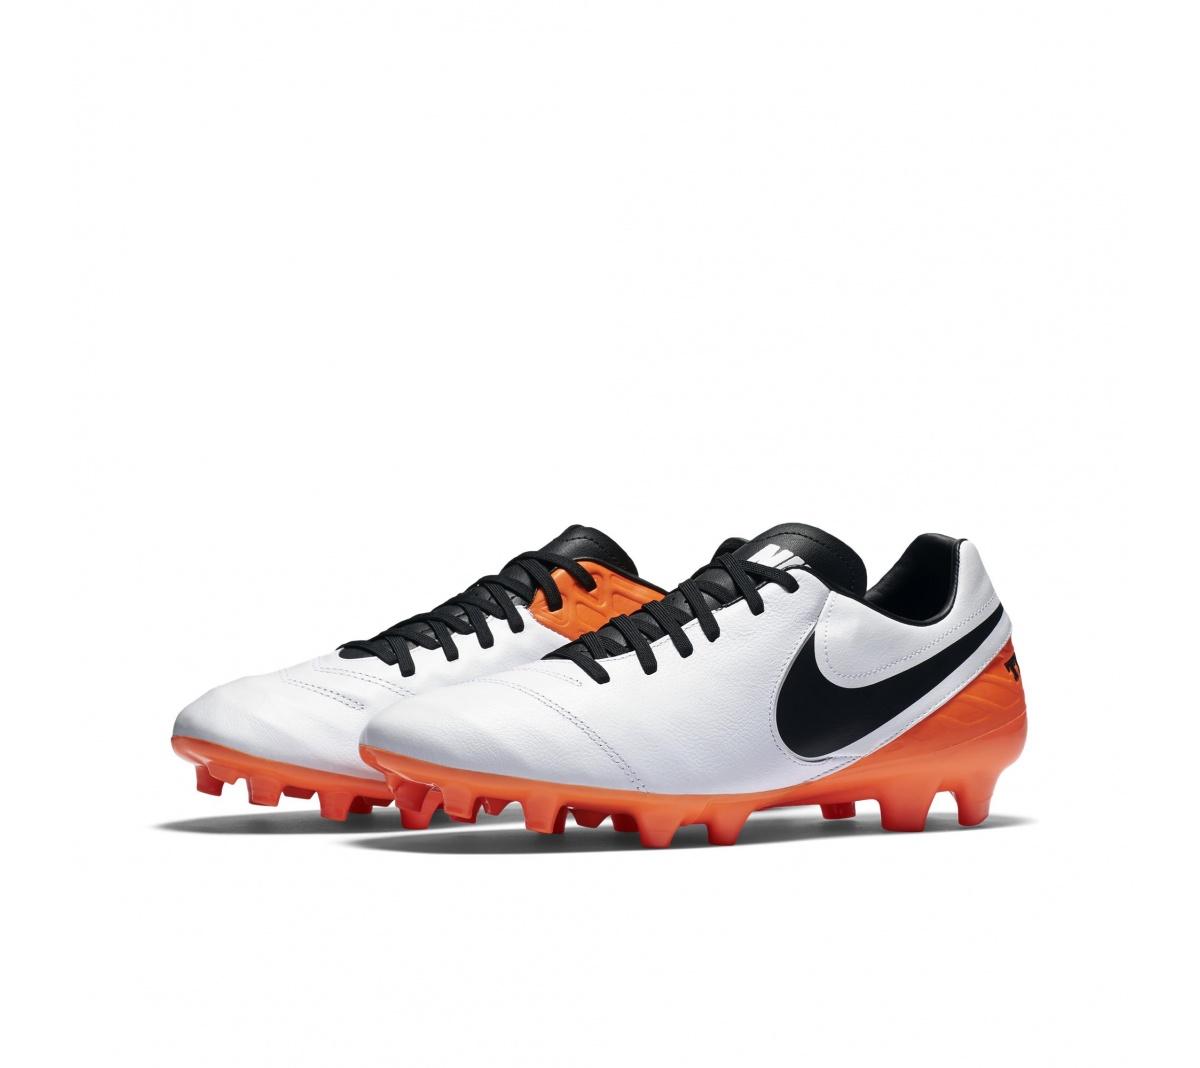 Chuteira Nike Tiempo Mystic FG Branco com Laranja - Mundo do Futebol f2ff3af604554